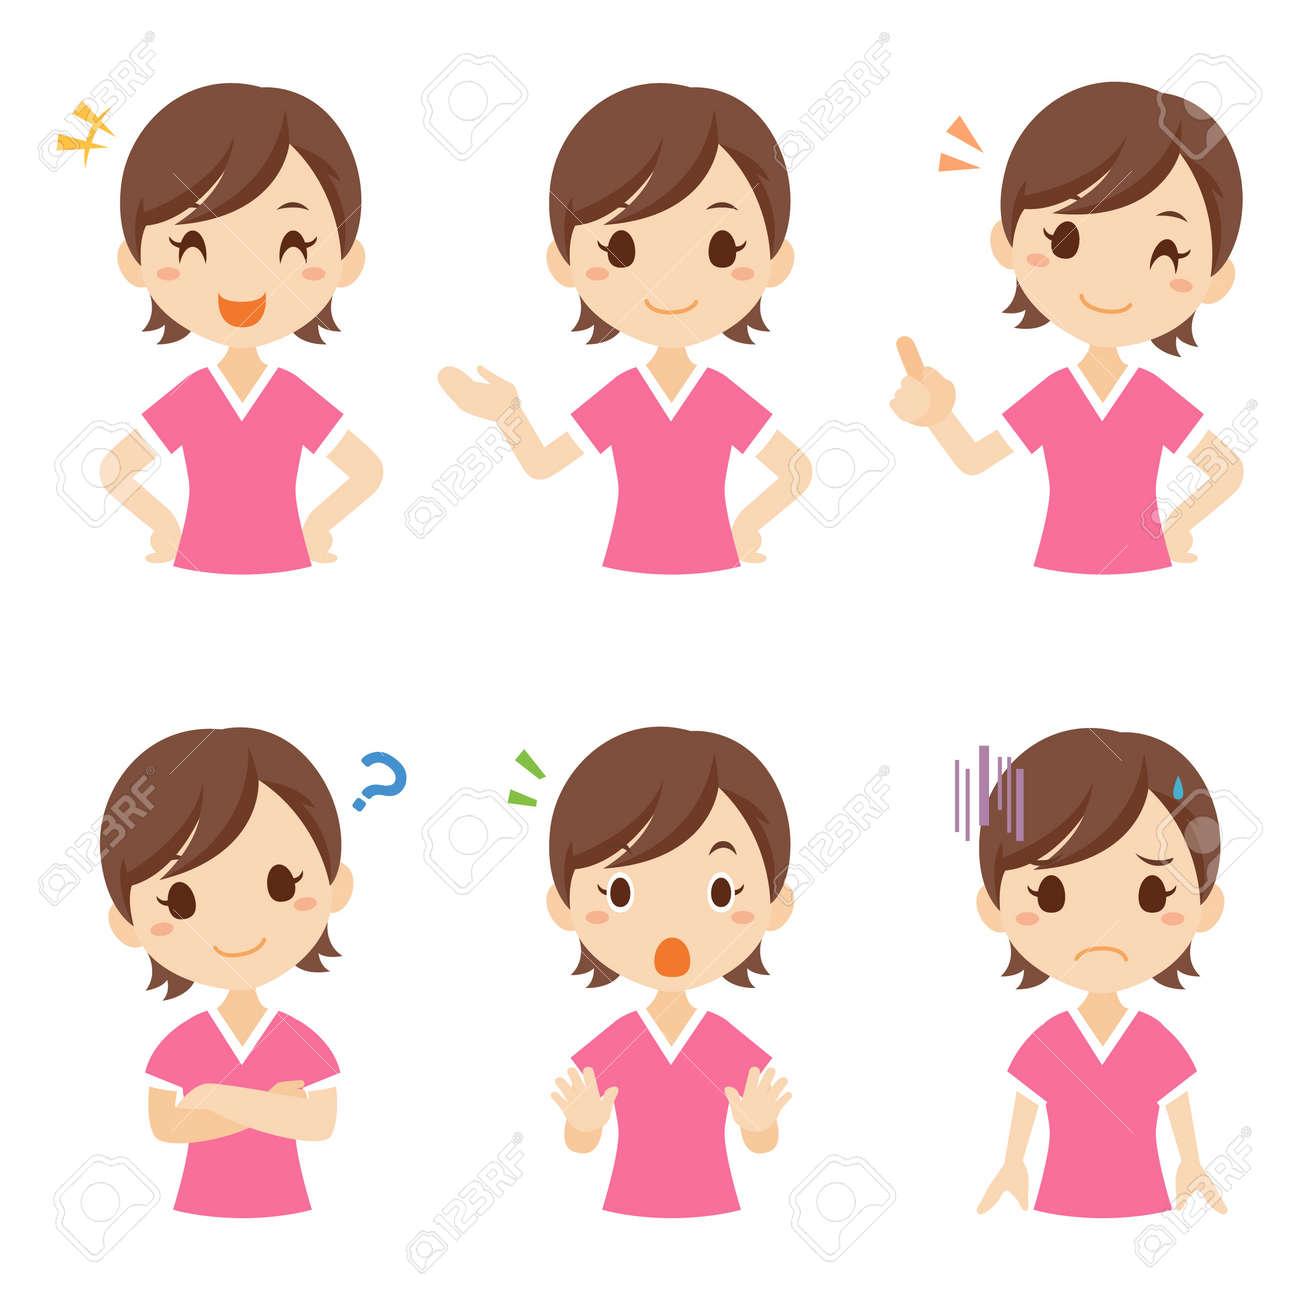 Girl Child Facial Expression Pose - 168556955